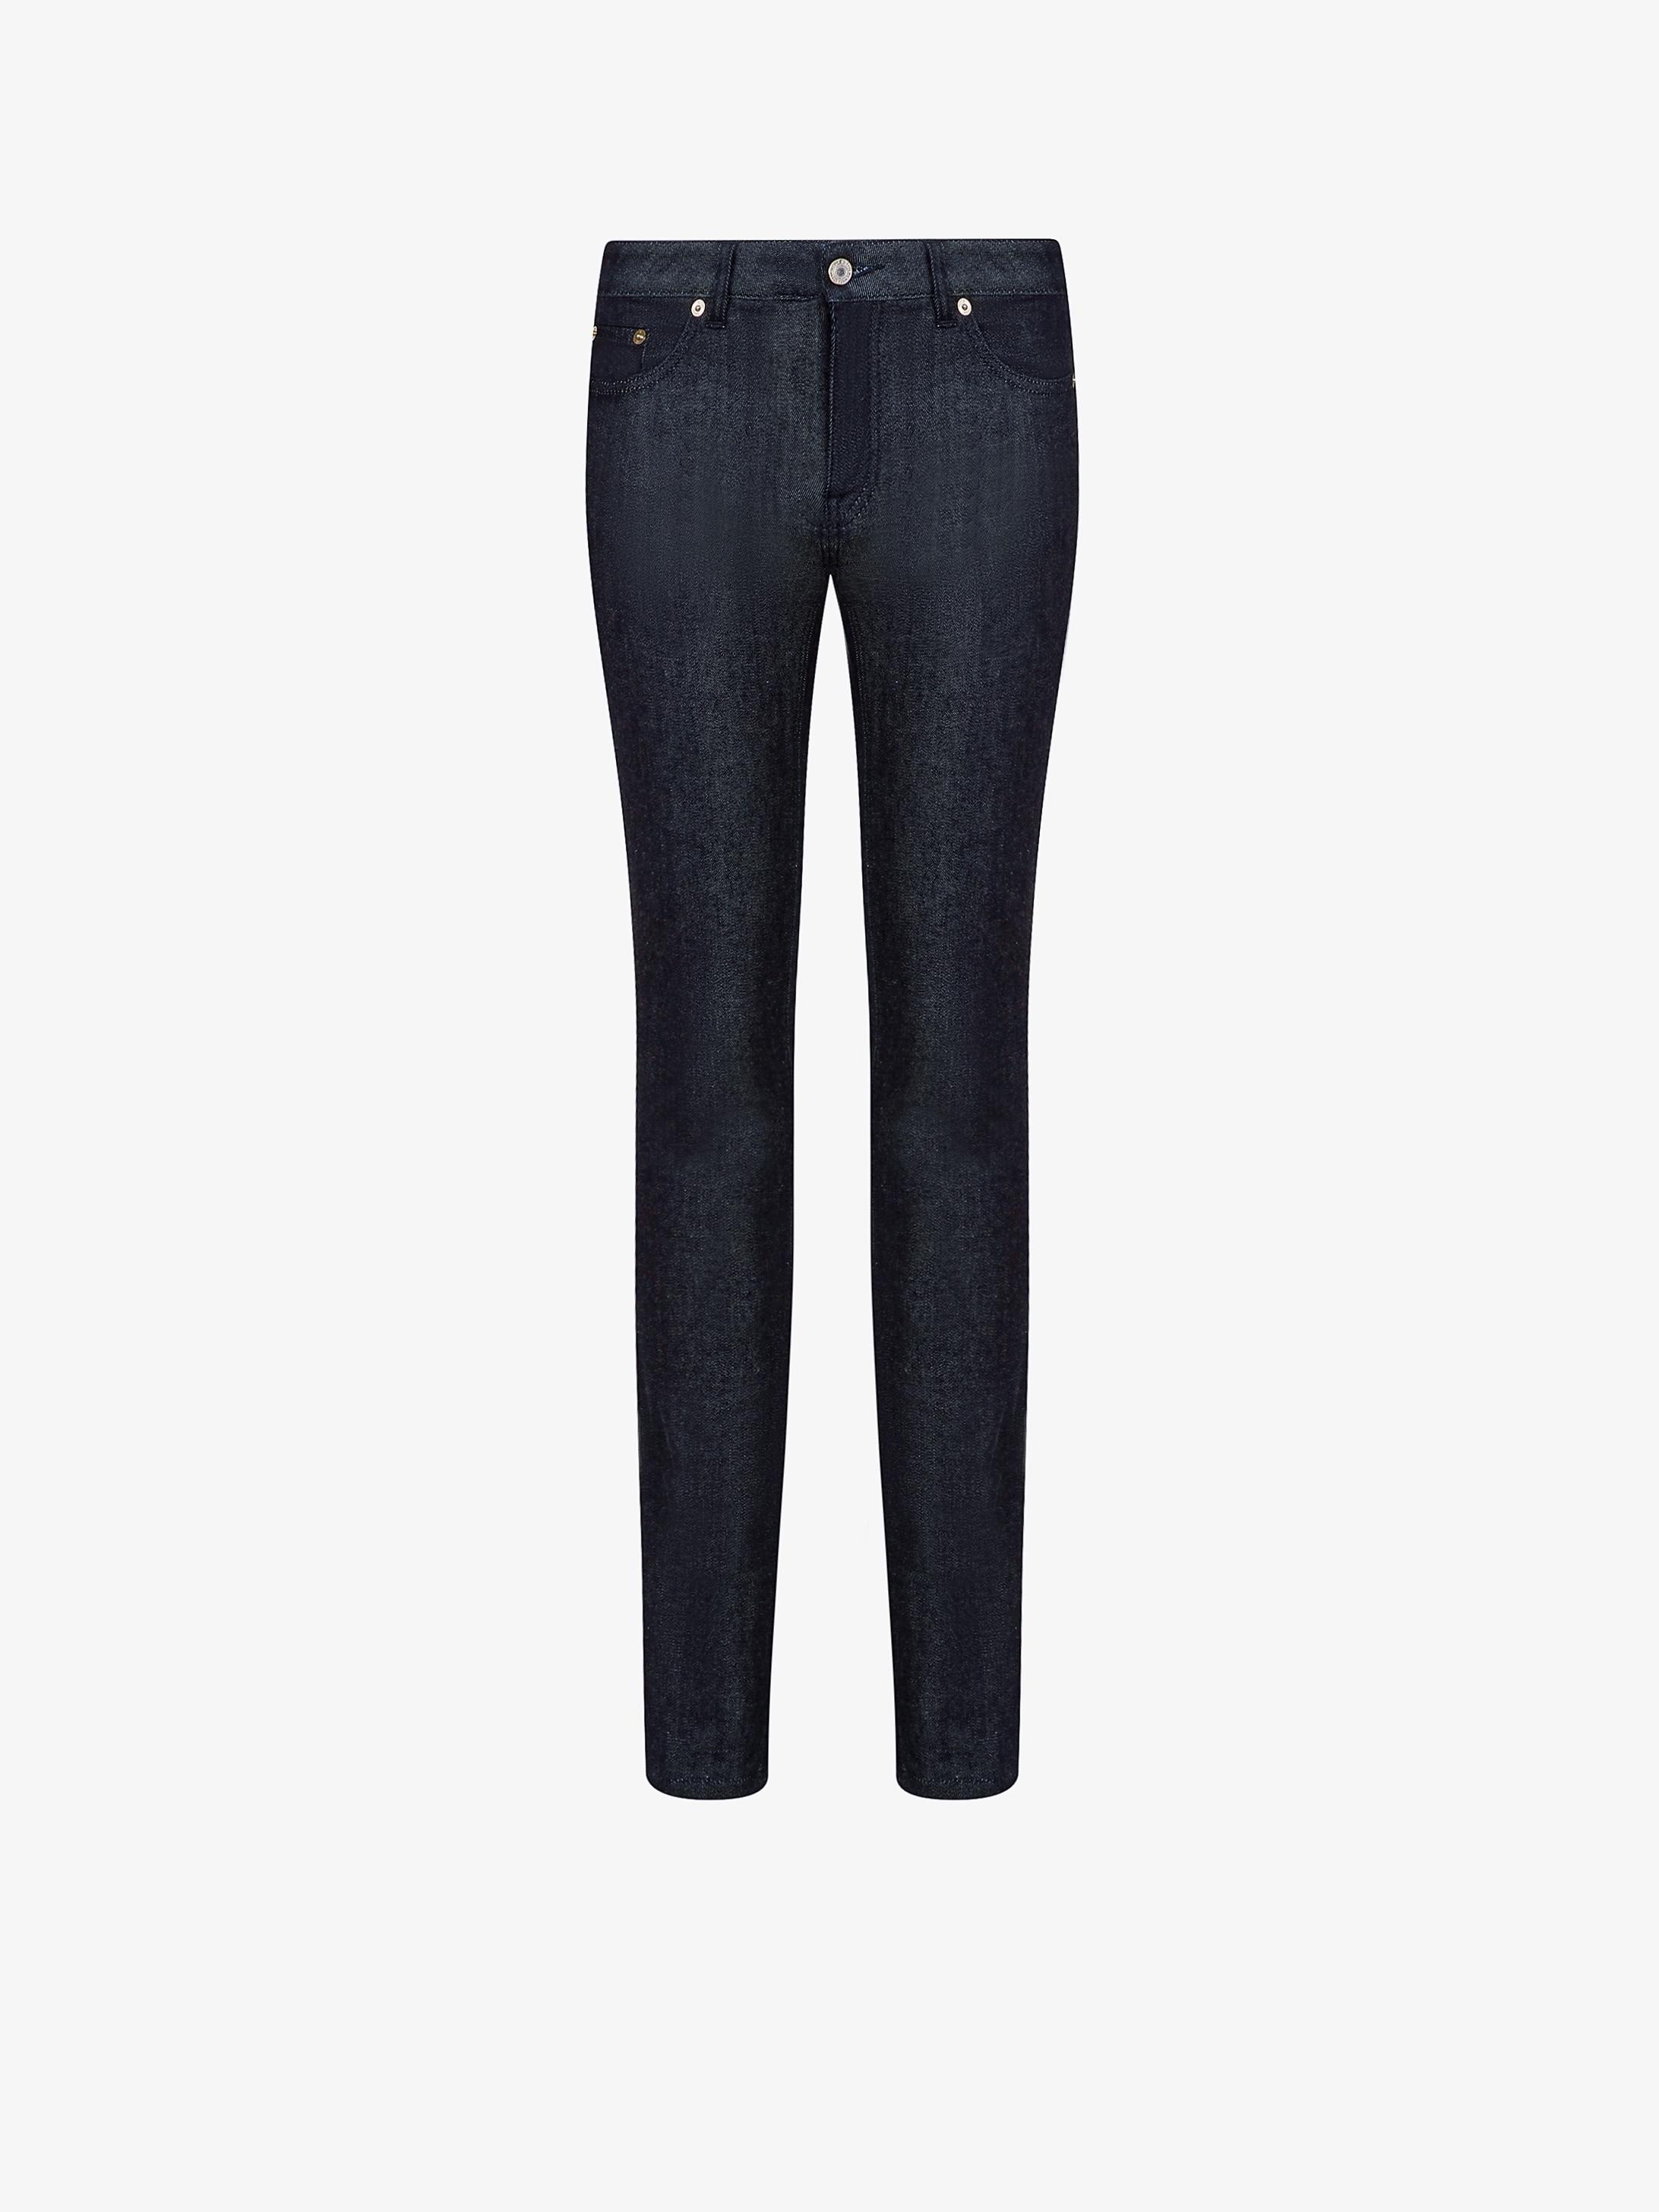 GIVENCHY PARIS skinny jeans